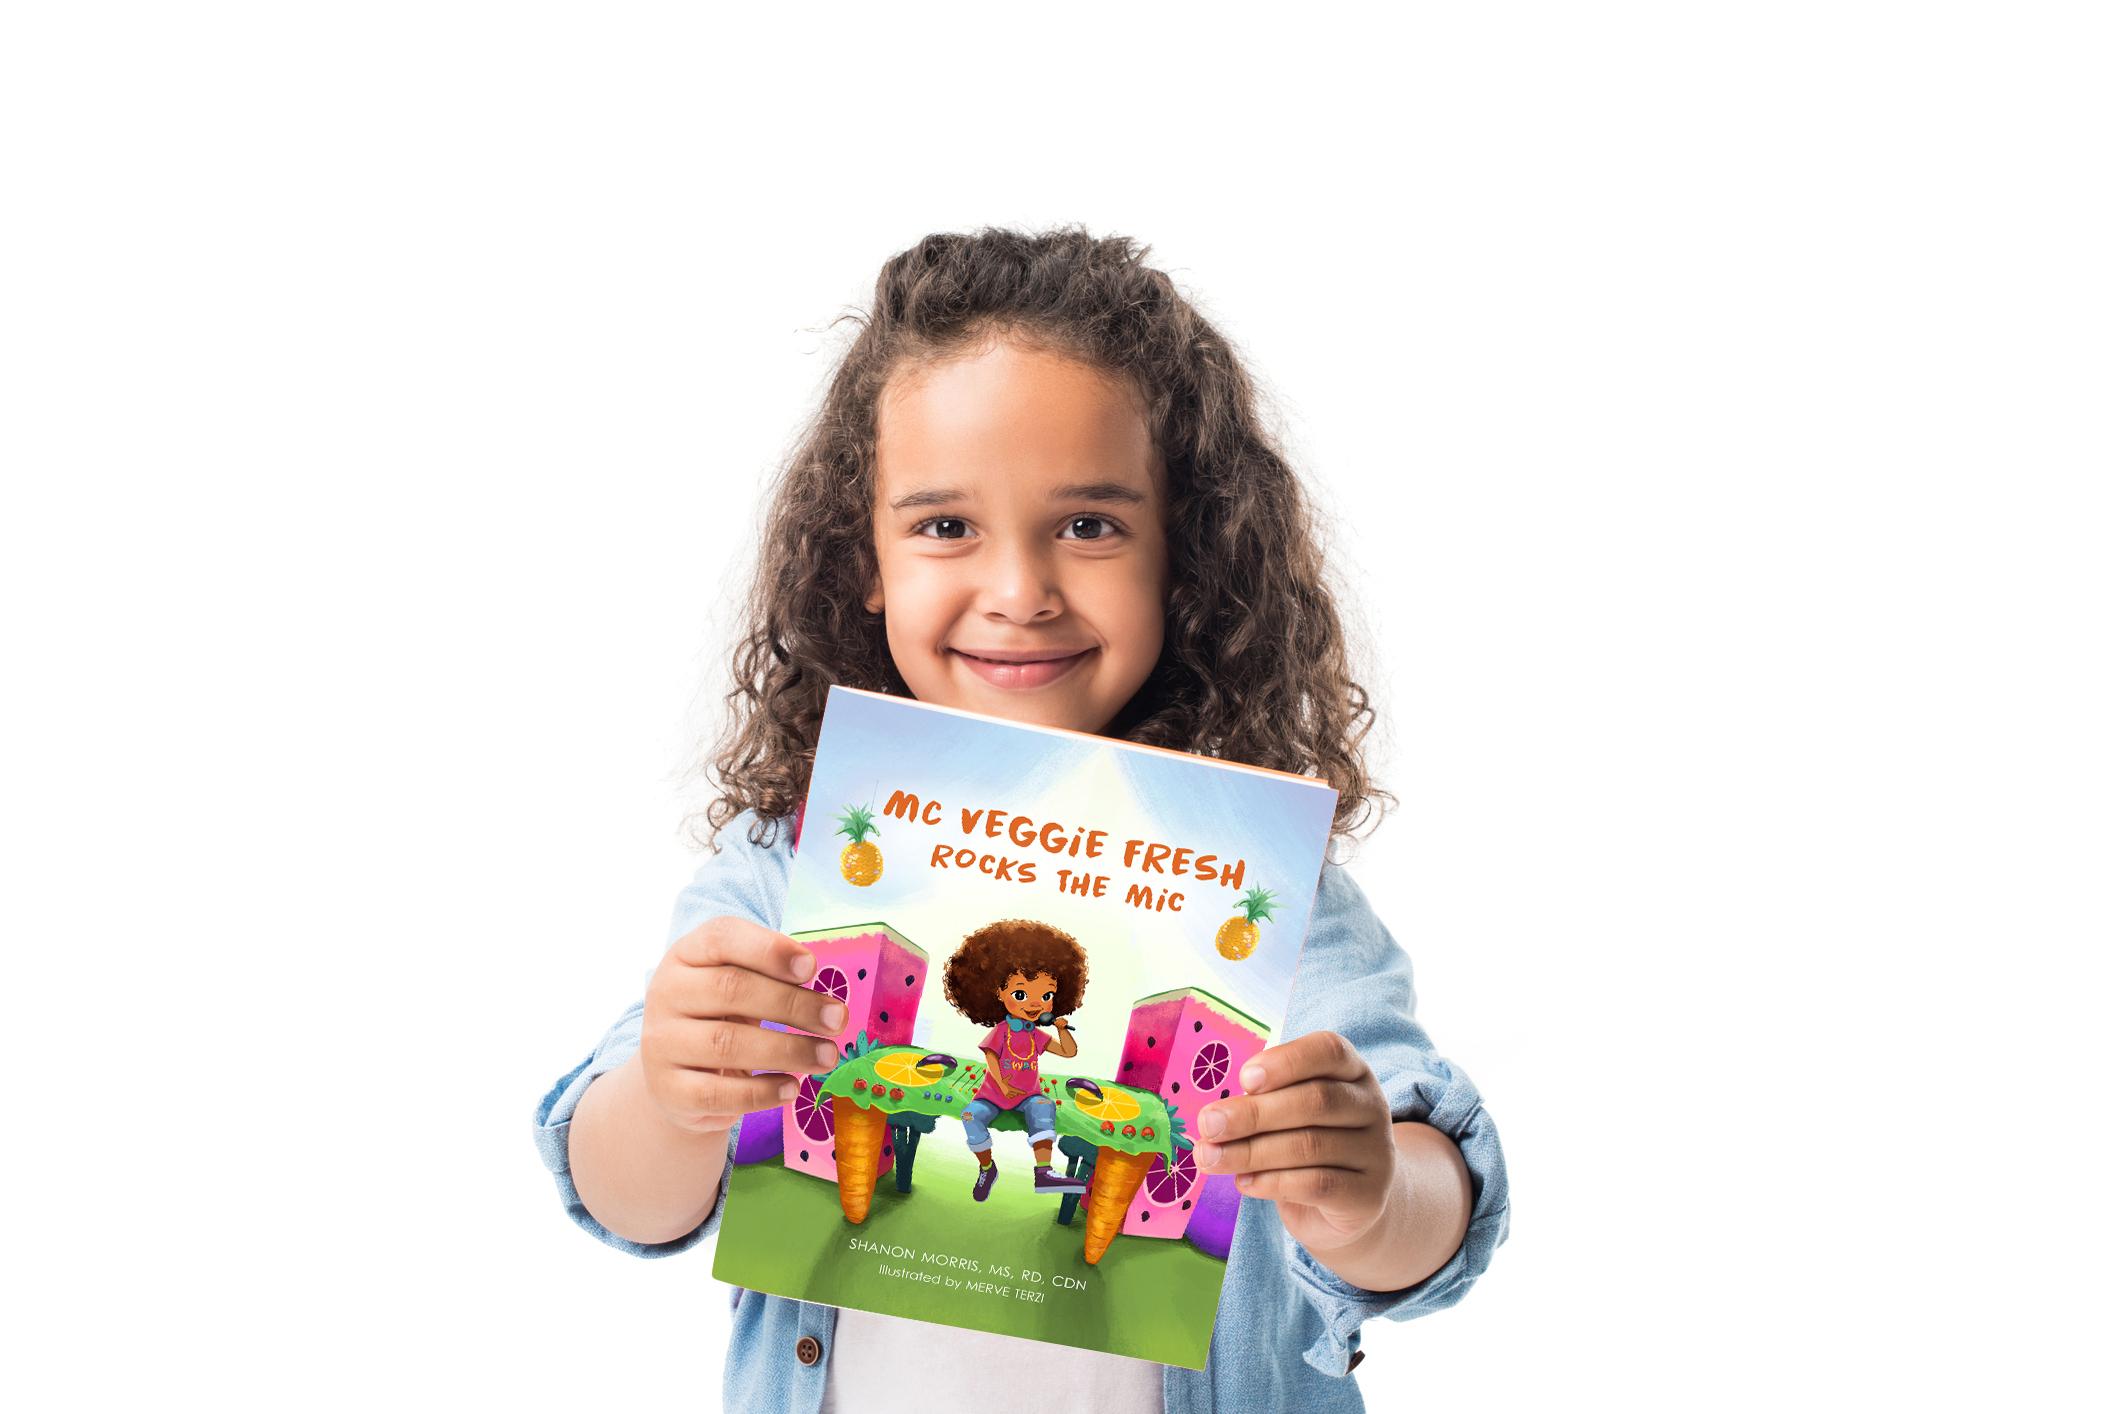 mcveggie book photo 1.jpg